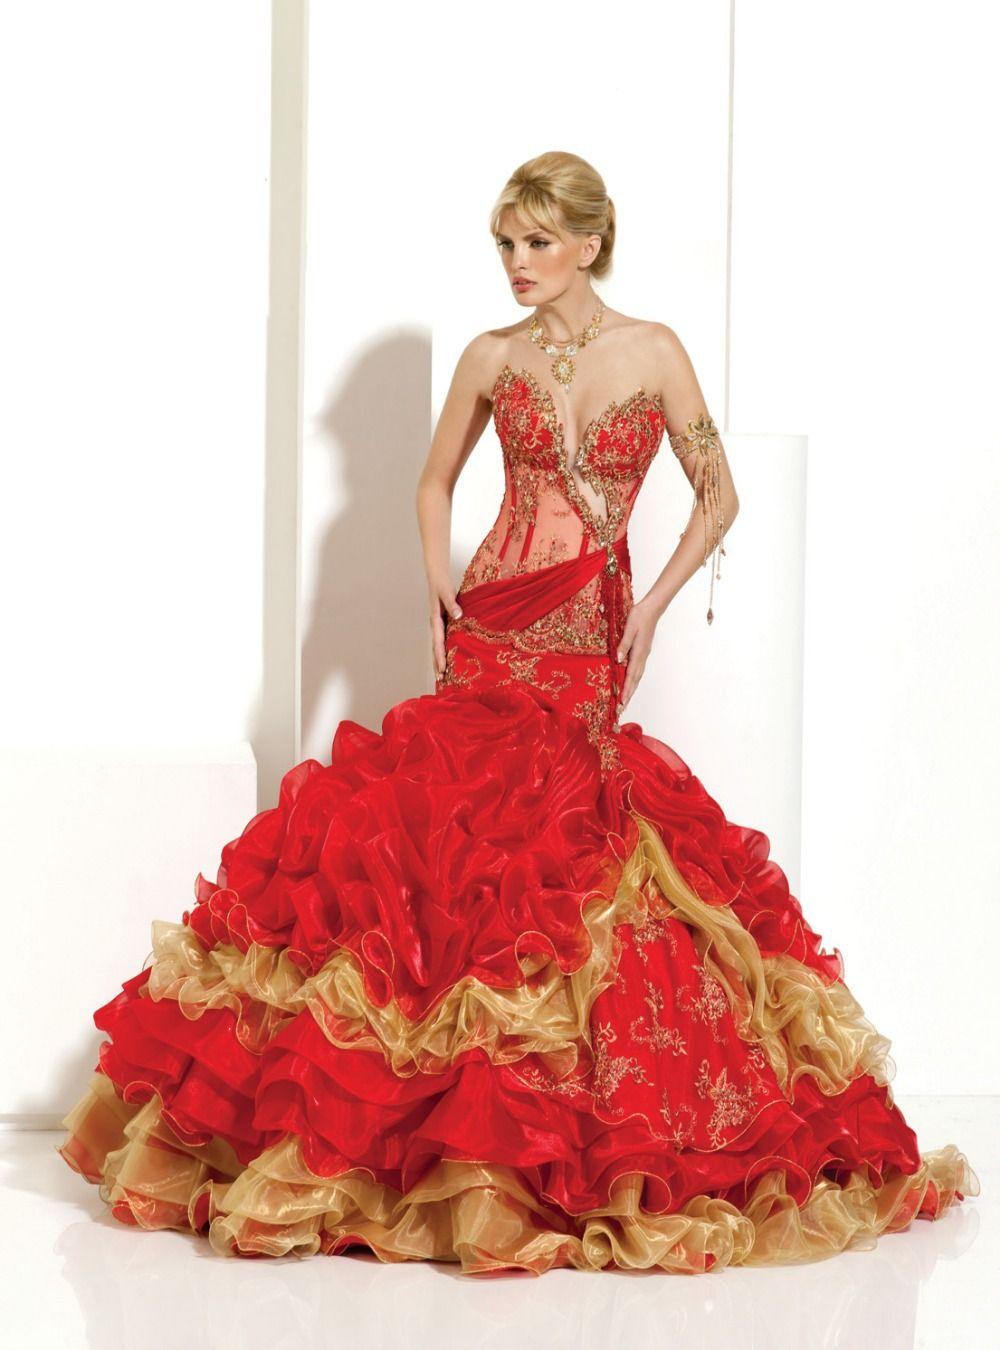 red and gold wedding dresses | wedding dresses | Pinterest | Gold ...